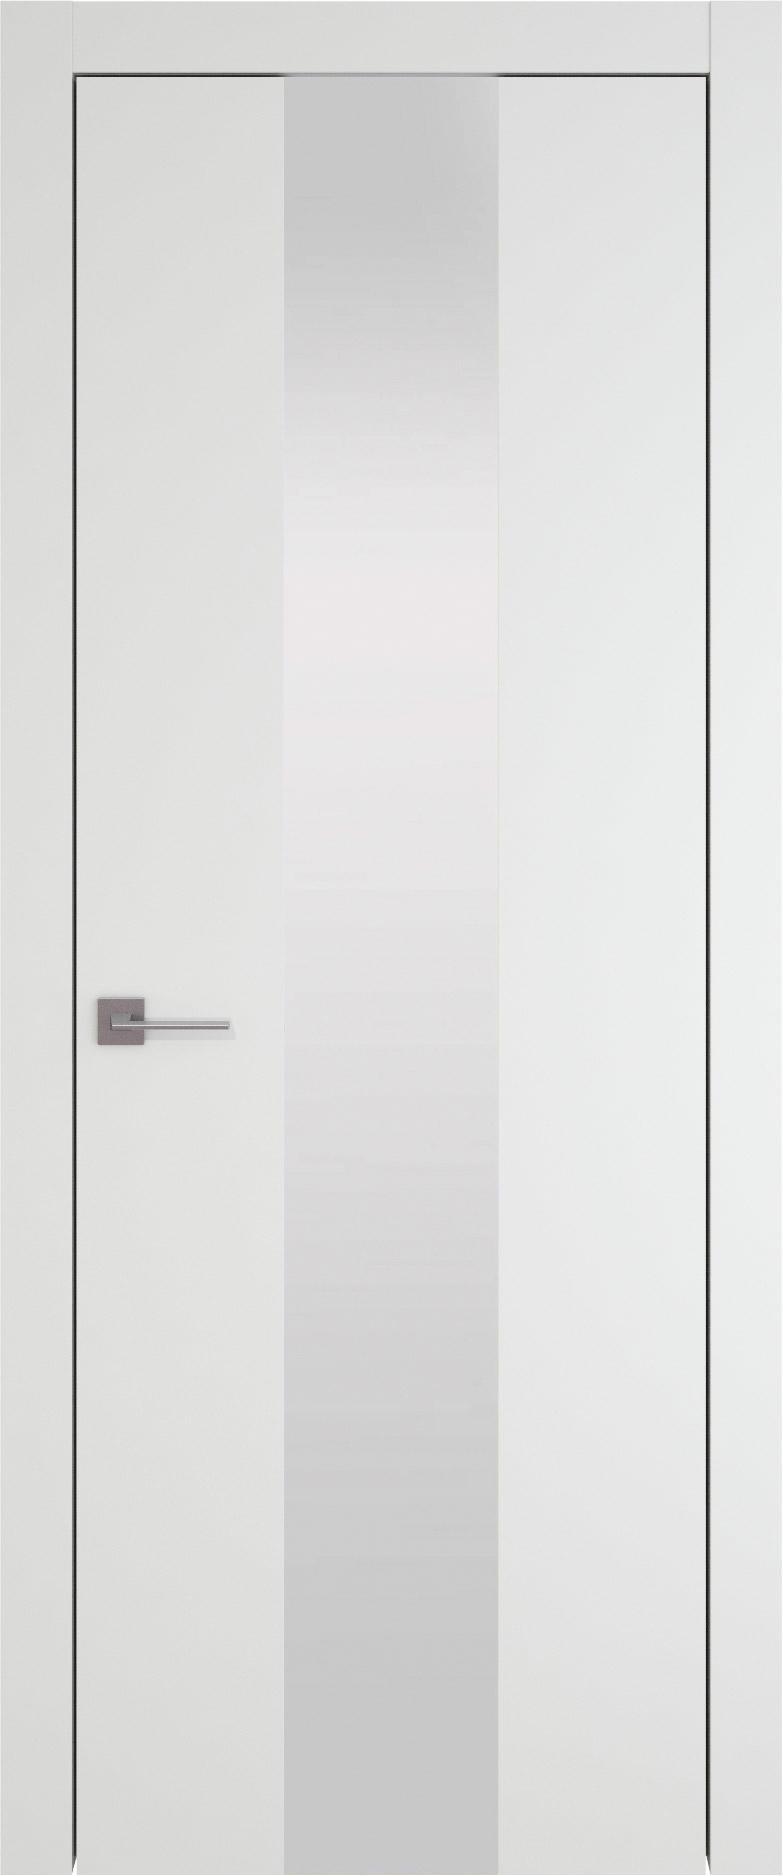 Tivoli Ж-1 цвет - Белая эмаль (RAL 9003) Со стеклом (ДО)